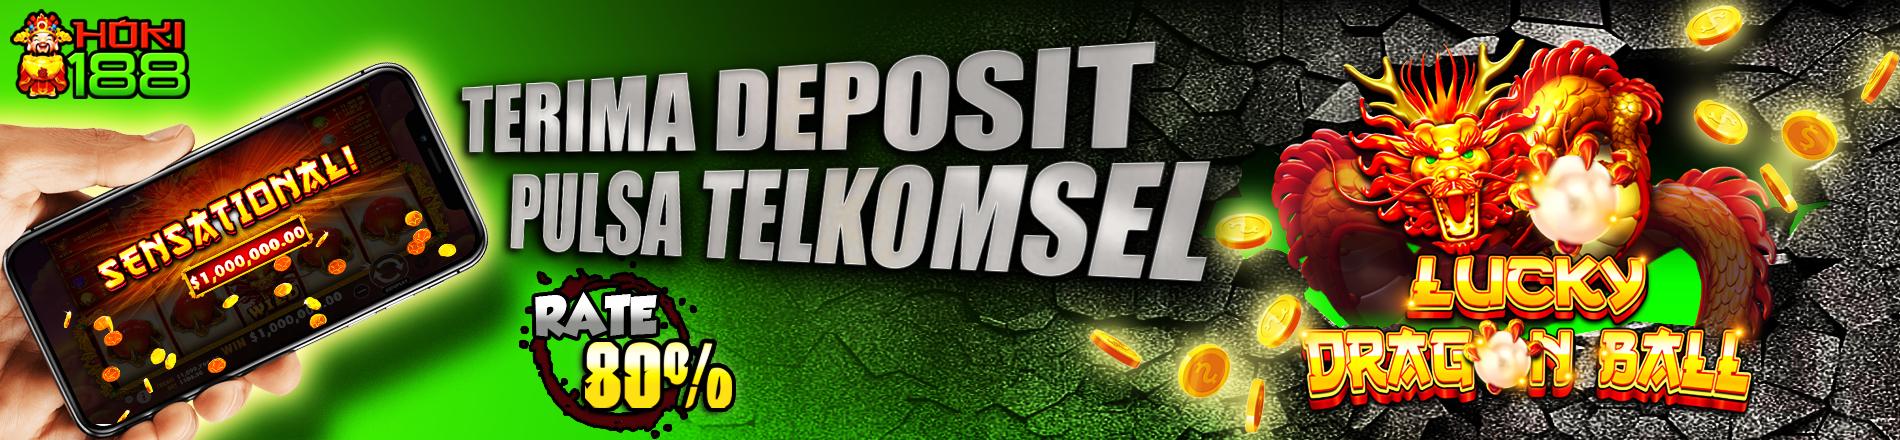 Hoki188 Menerima Deposit Pulsa Telkomsel